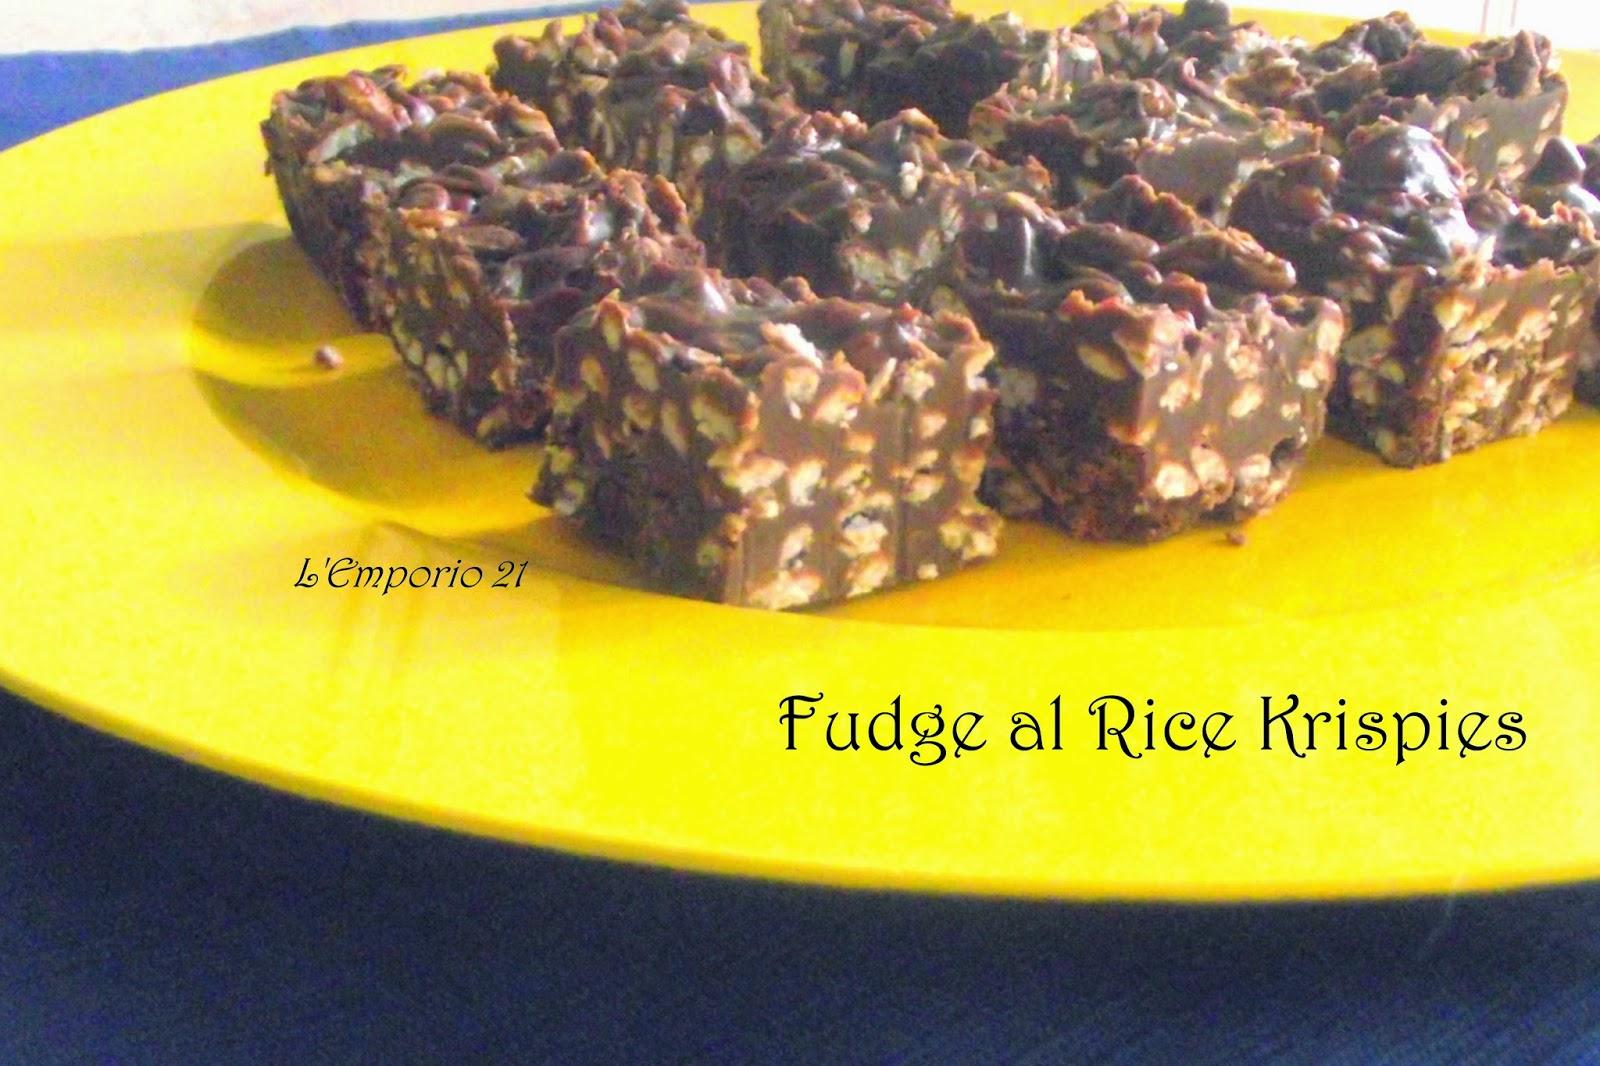 fudge al rice krispies e le paturnie